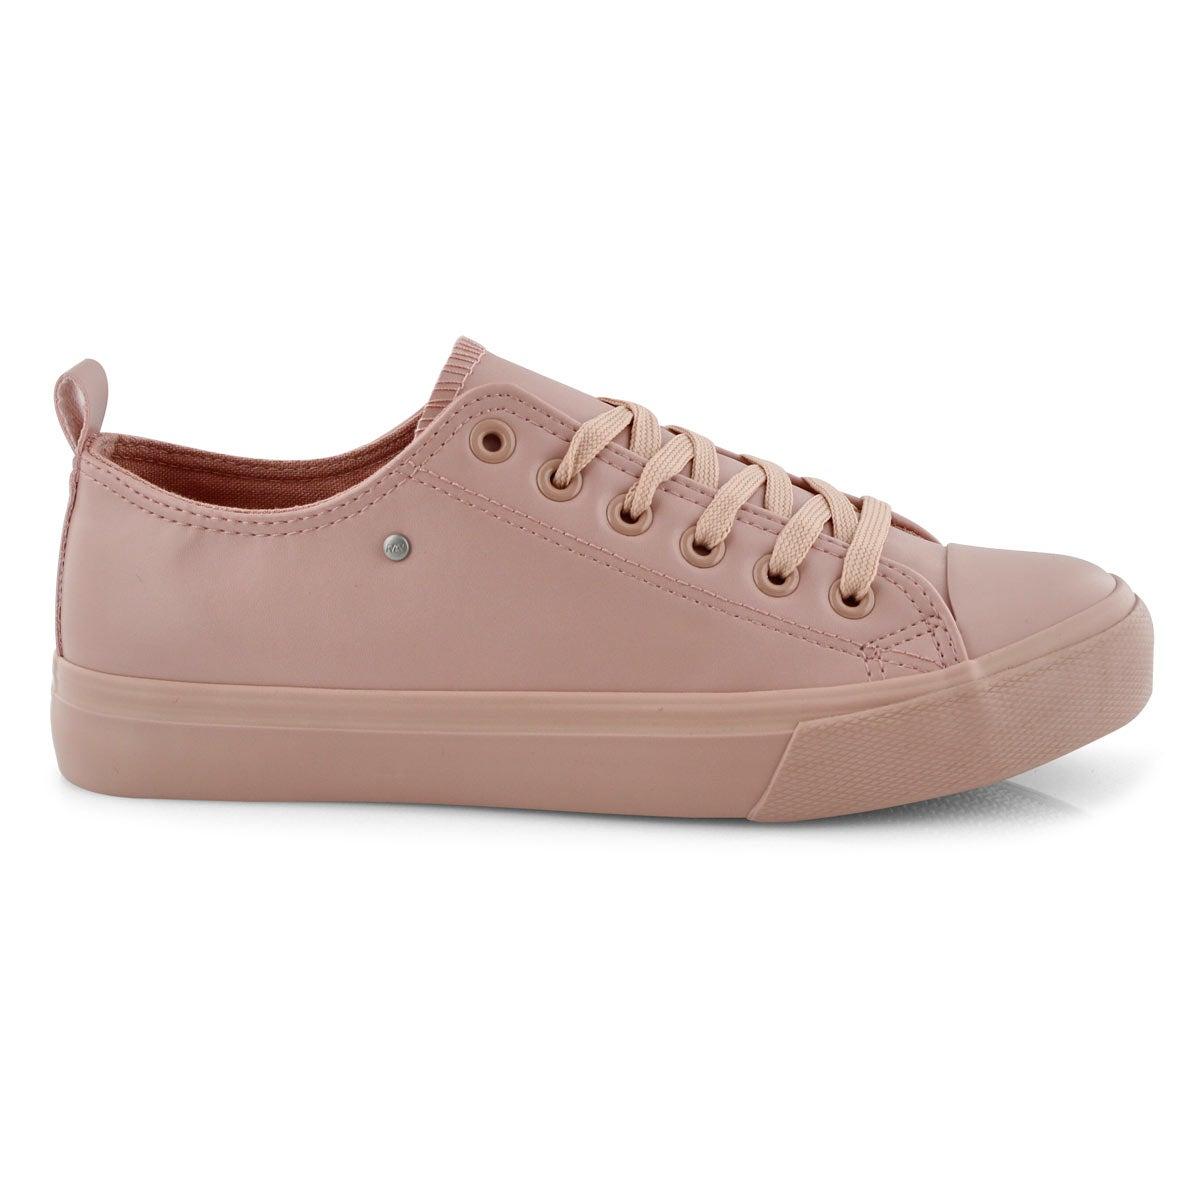 Lds Hazel lily vegan lace up sneaker